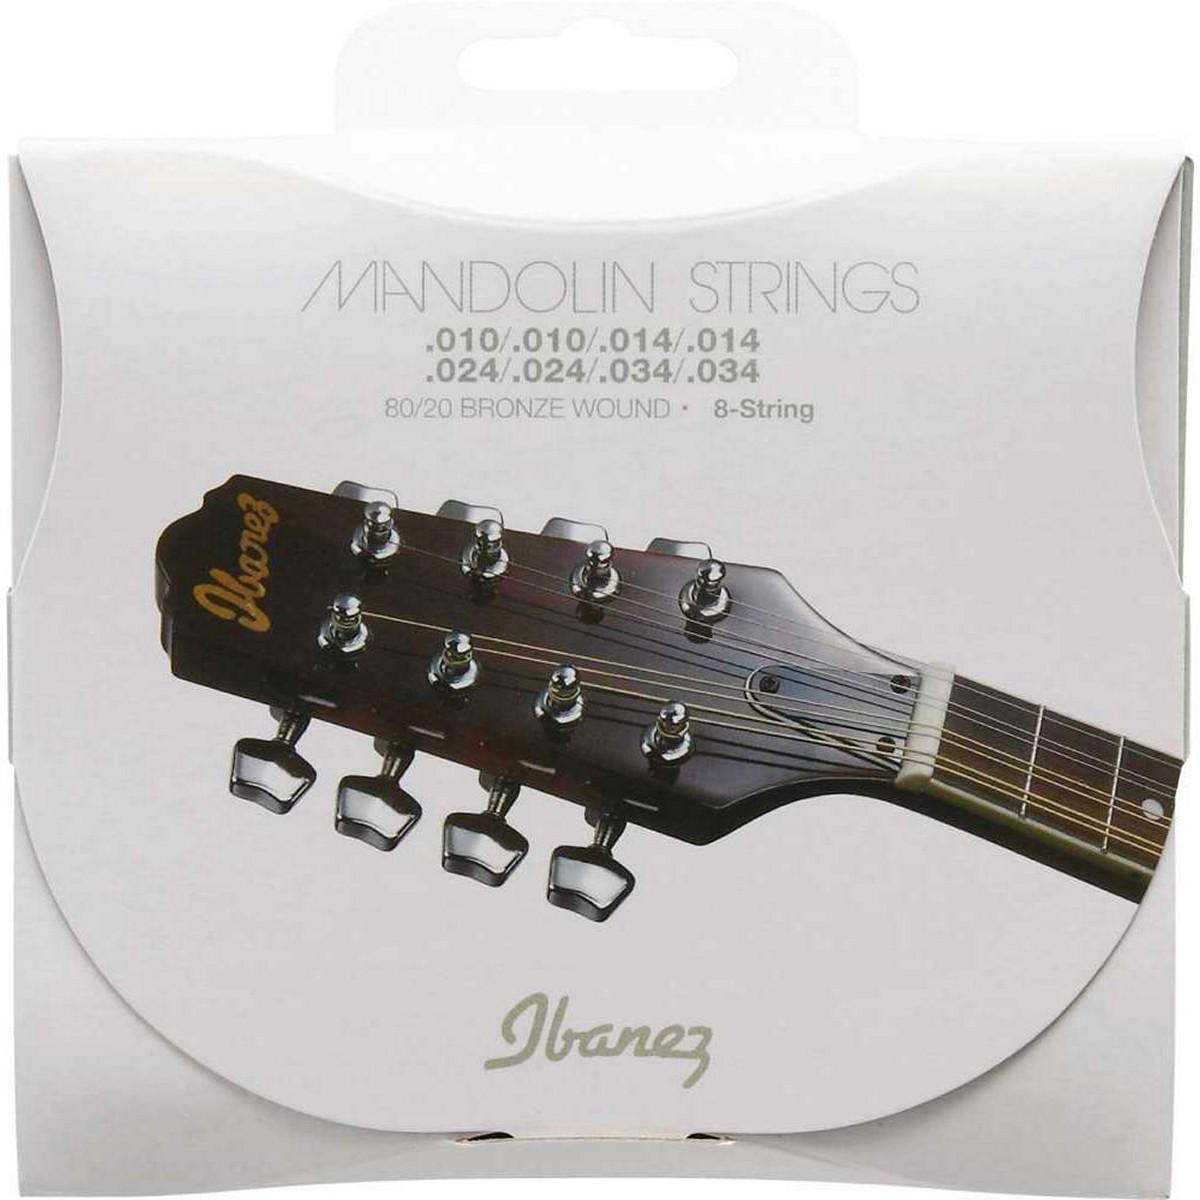 IBANEZ IMDS4 - MUTA MANDOLINO 4 CORDE 010-034